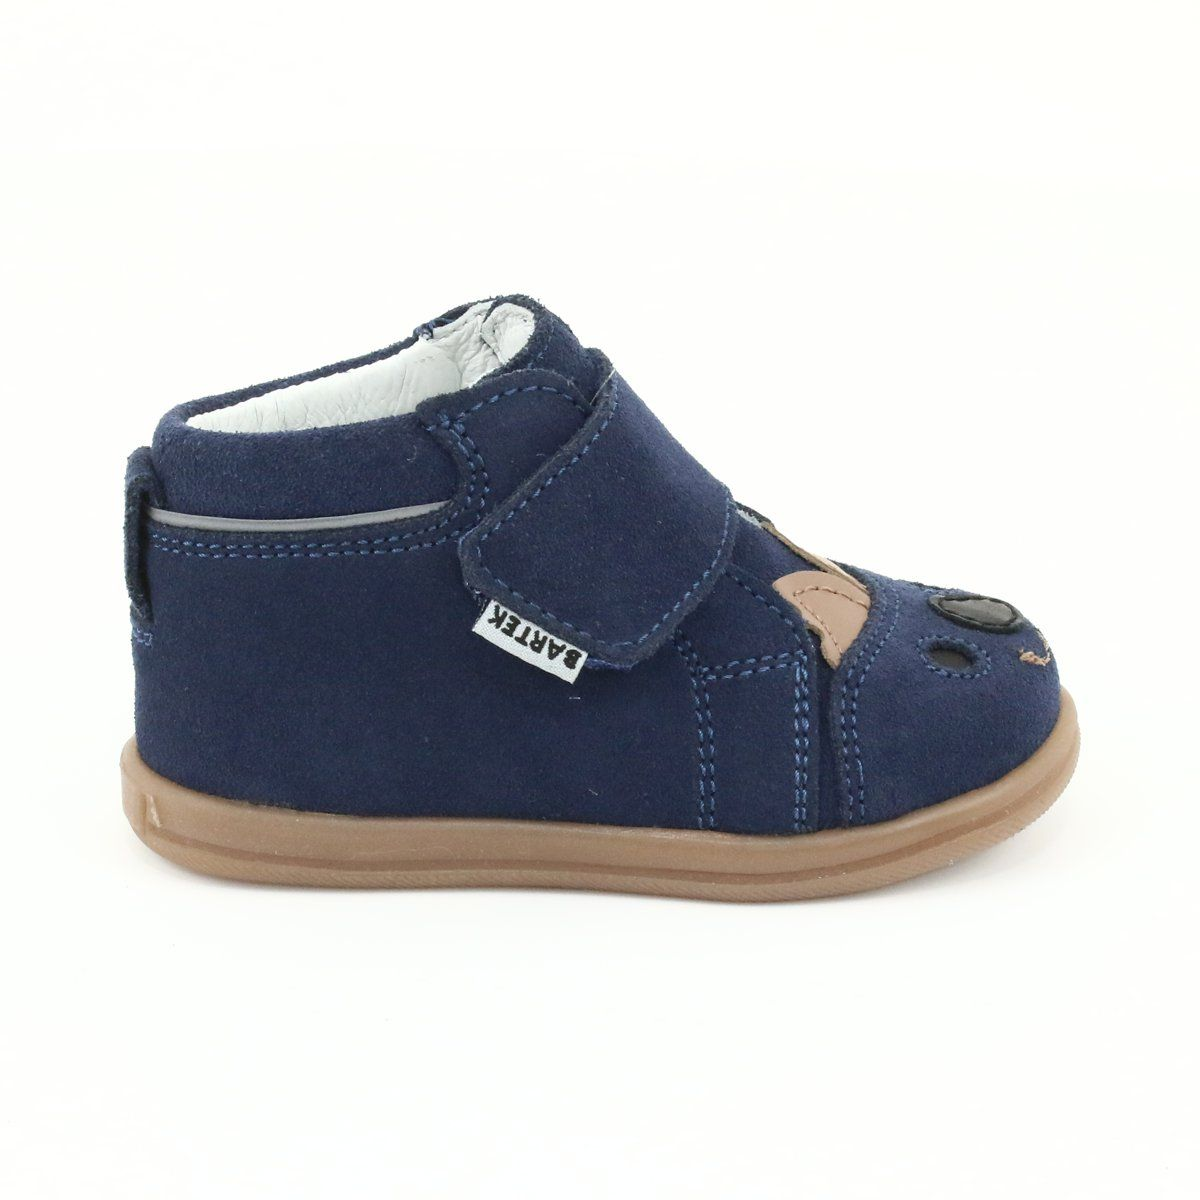 Trzewiki Na Rzepy Panda Bartek 71150 Granatowe Boots Womens Boots Flat Globe Skate Shoes